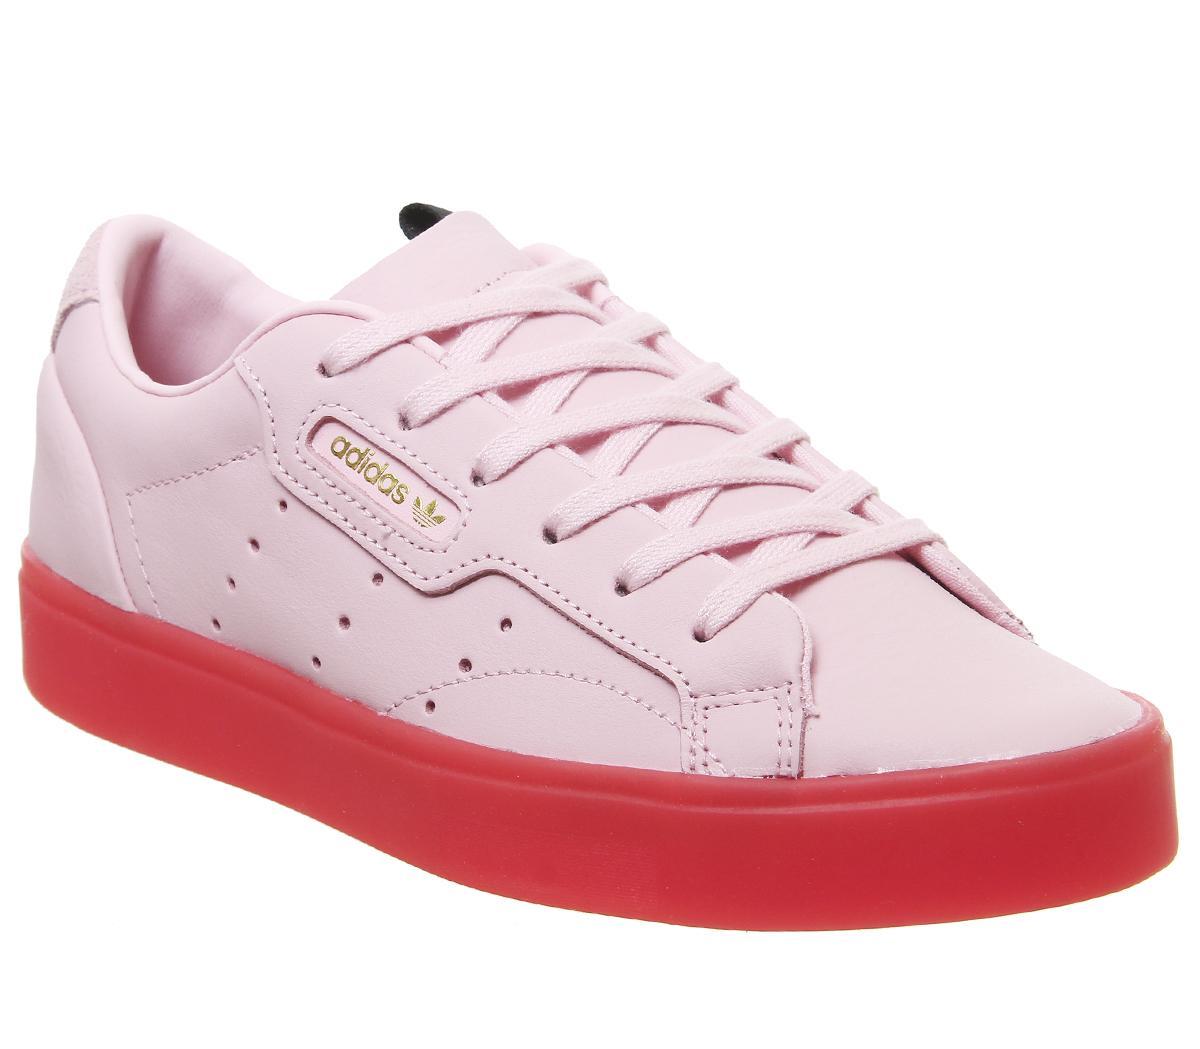 adidas Sleek Trainers Diva Red - Hers